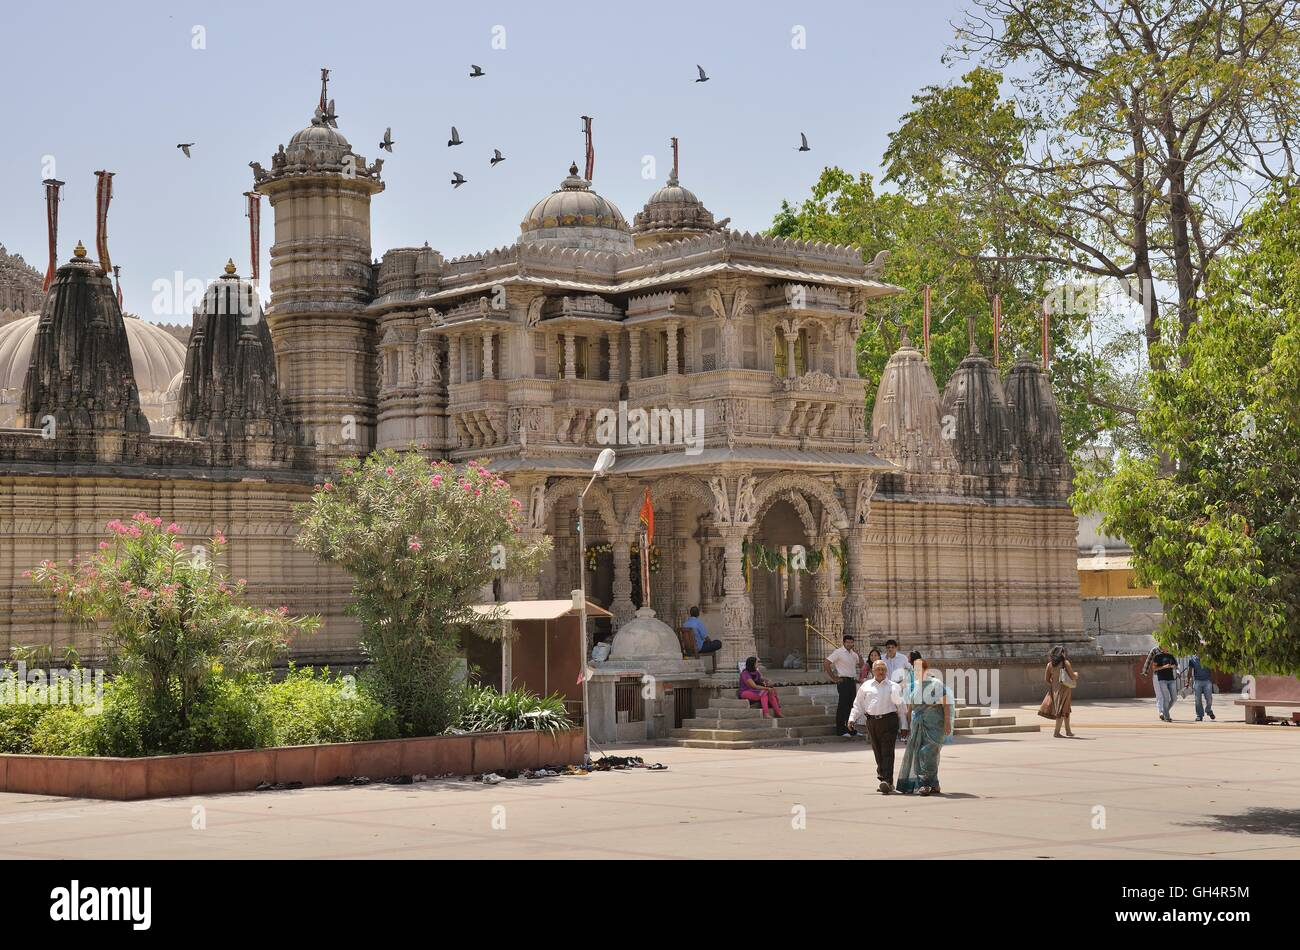 geography / travel, India, Hutheesing Temple of the Jain religion, Jainism, Jain dharma, Ahmedabad, Gujarat federal - Stock Image